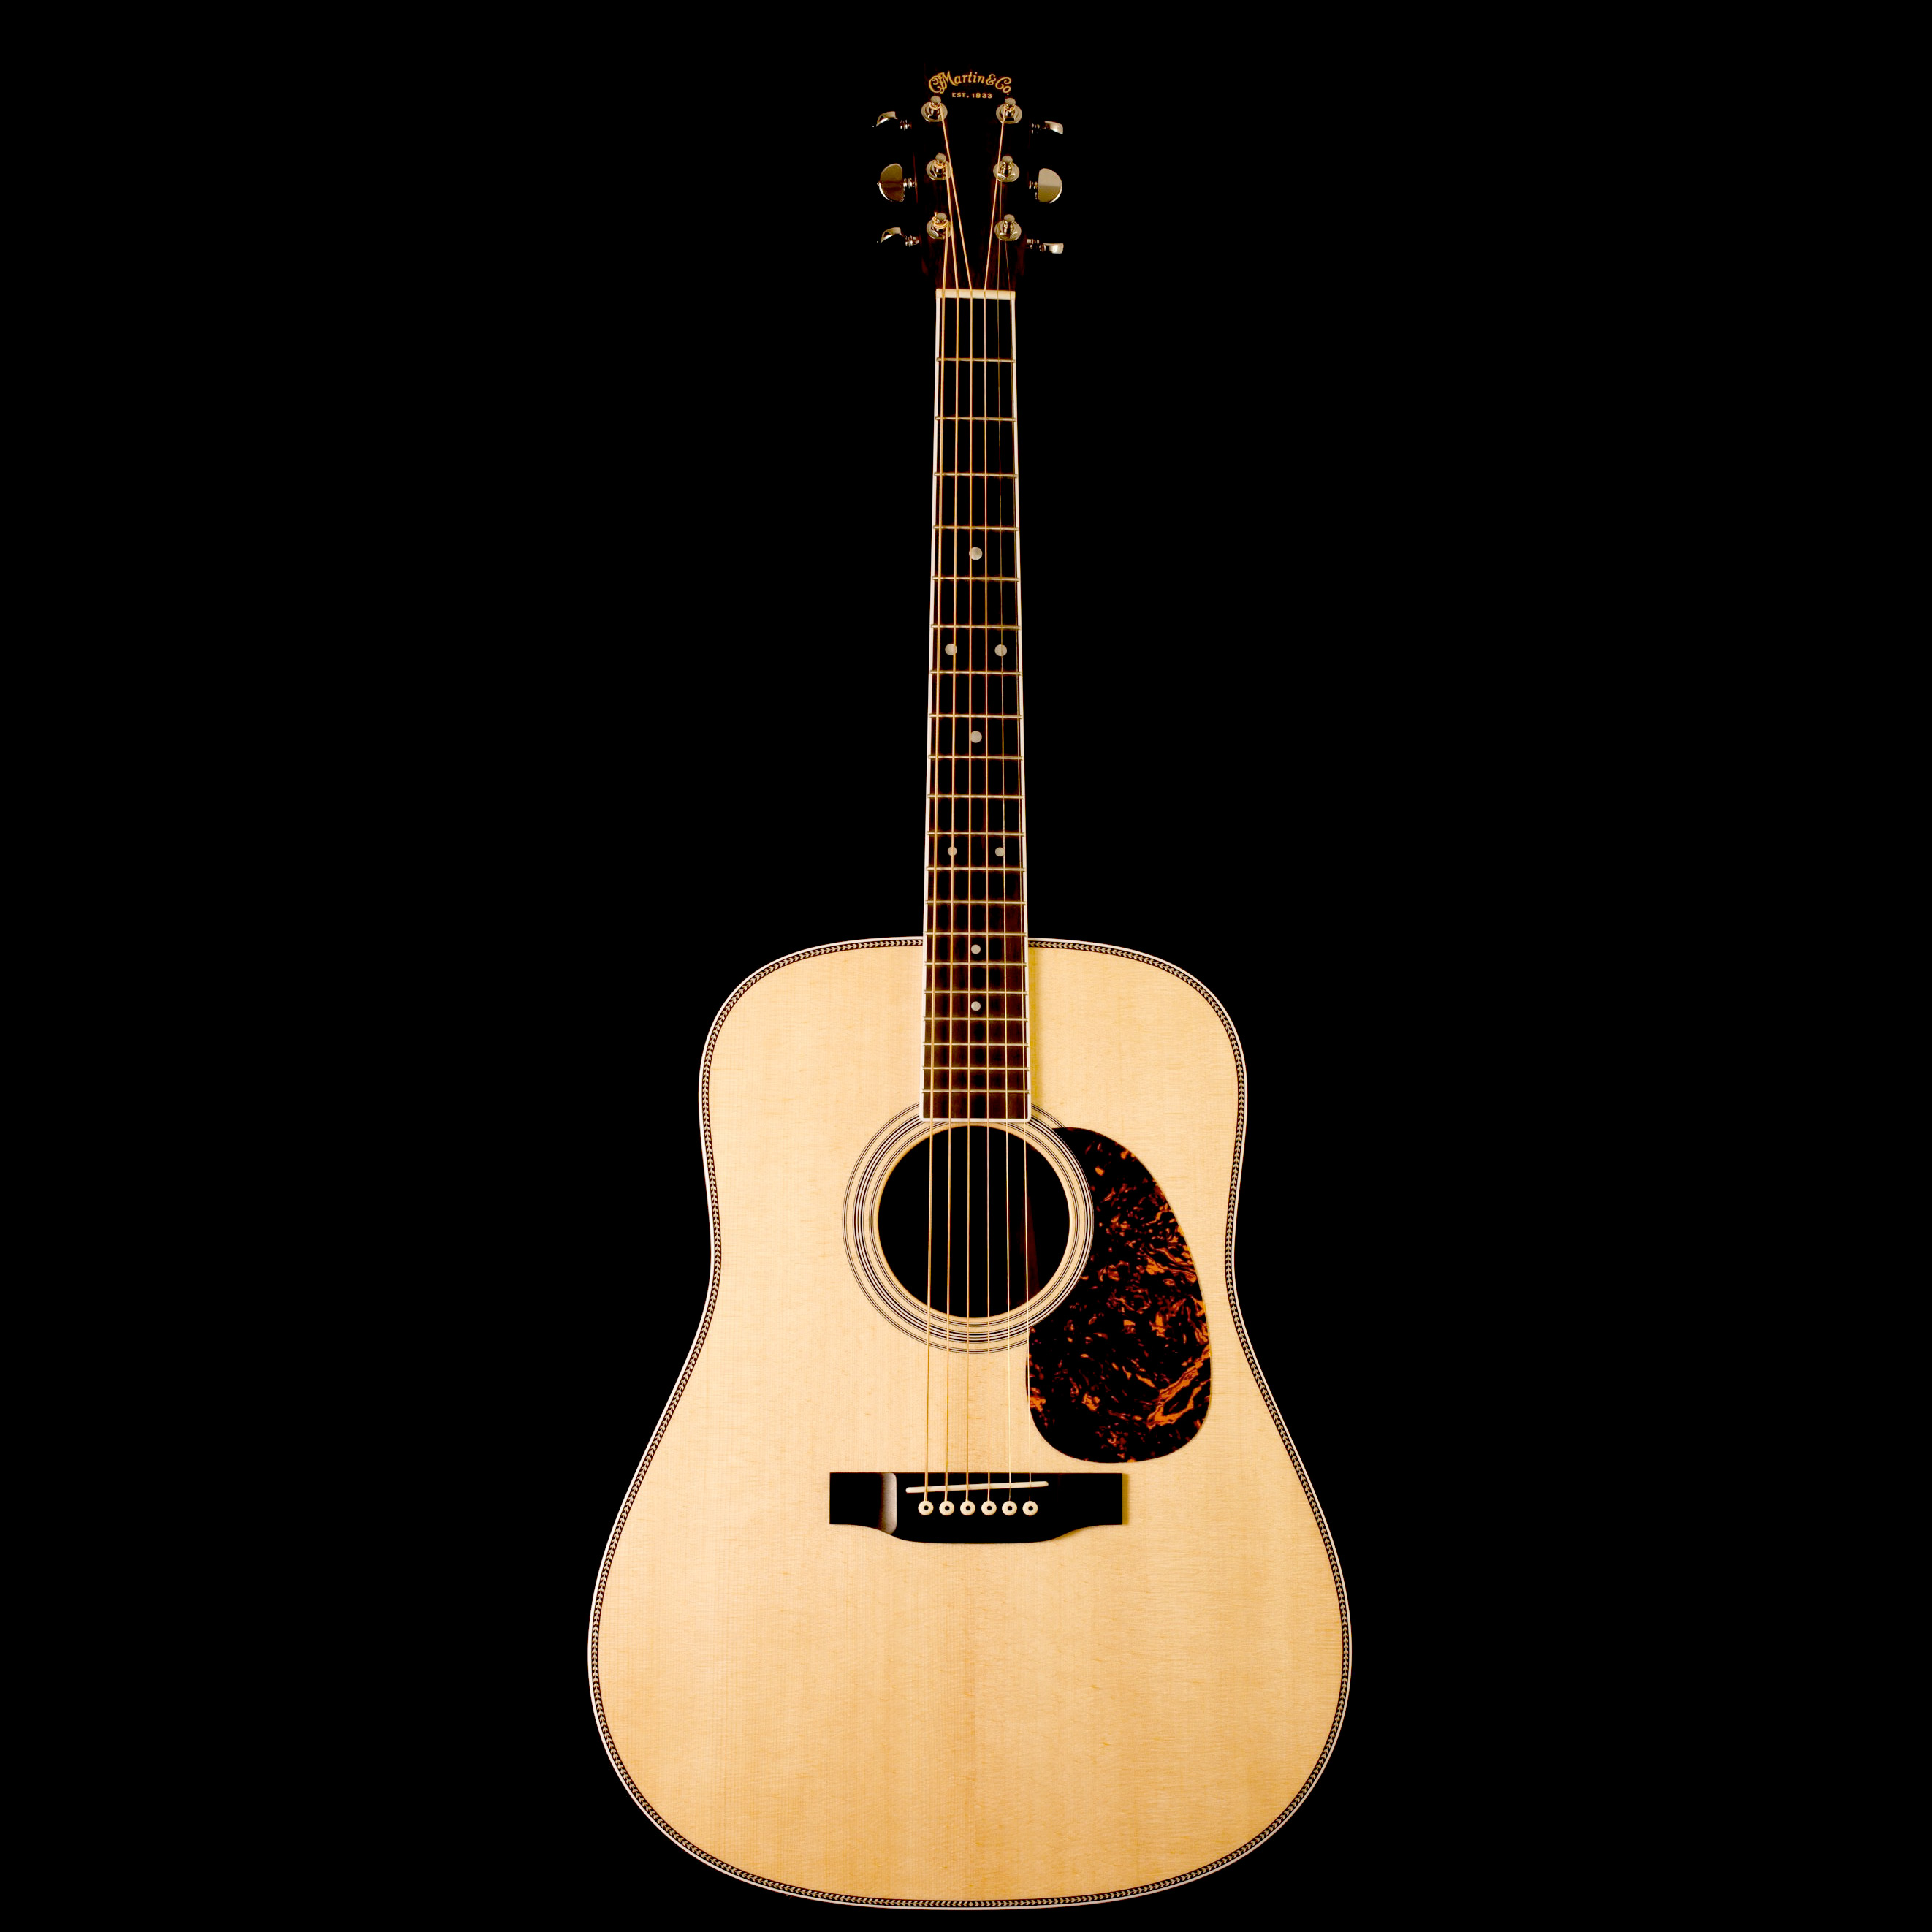 martin hd 35 standard series dreadnought acoustic guitar ebay. Black Bedroom Furniture Sets. Home Design Ideas